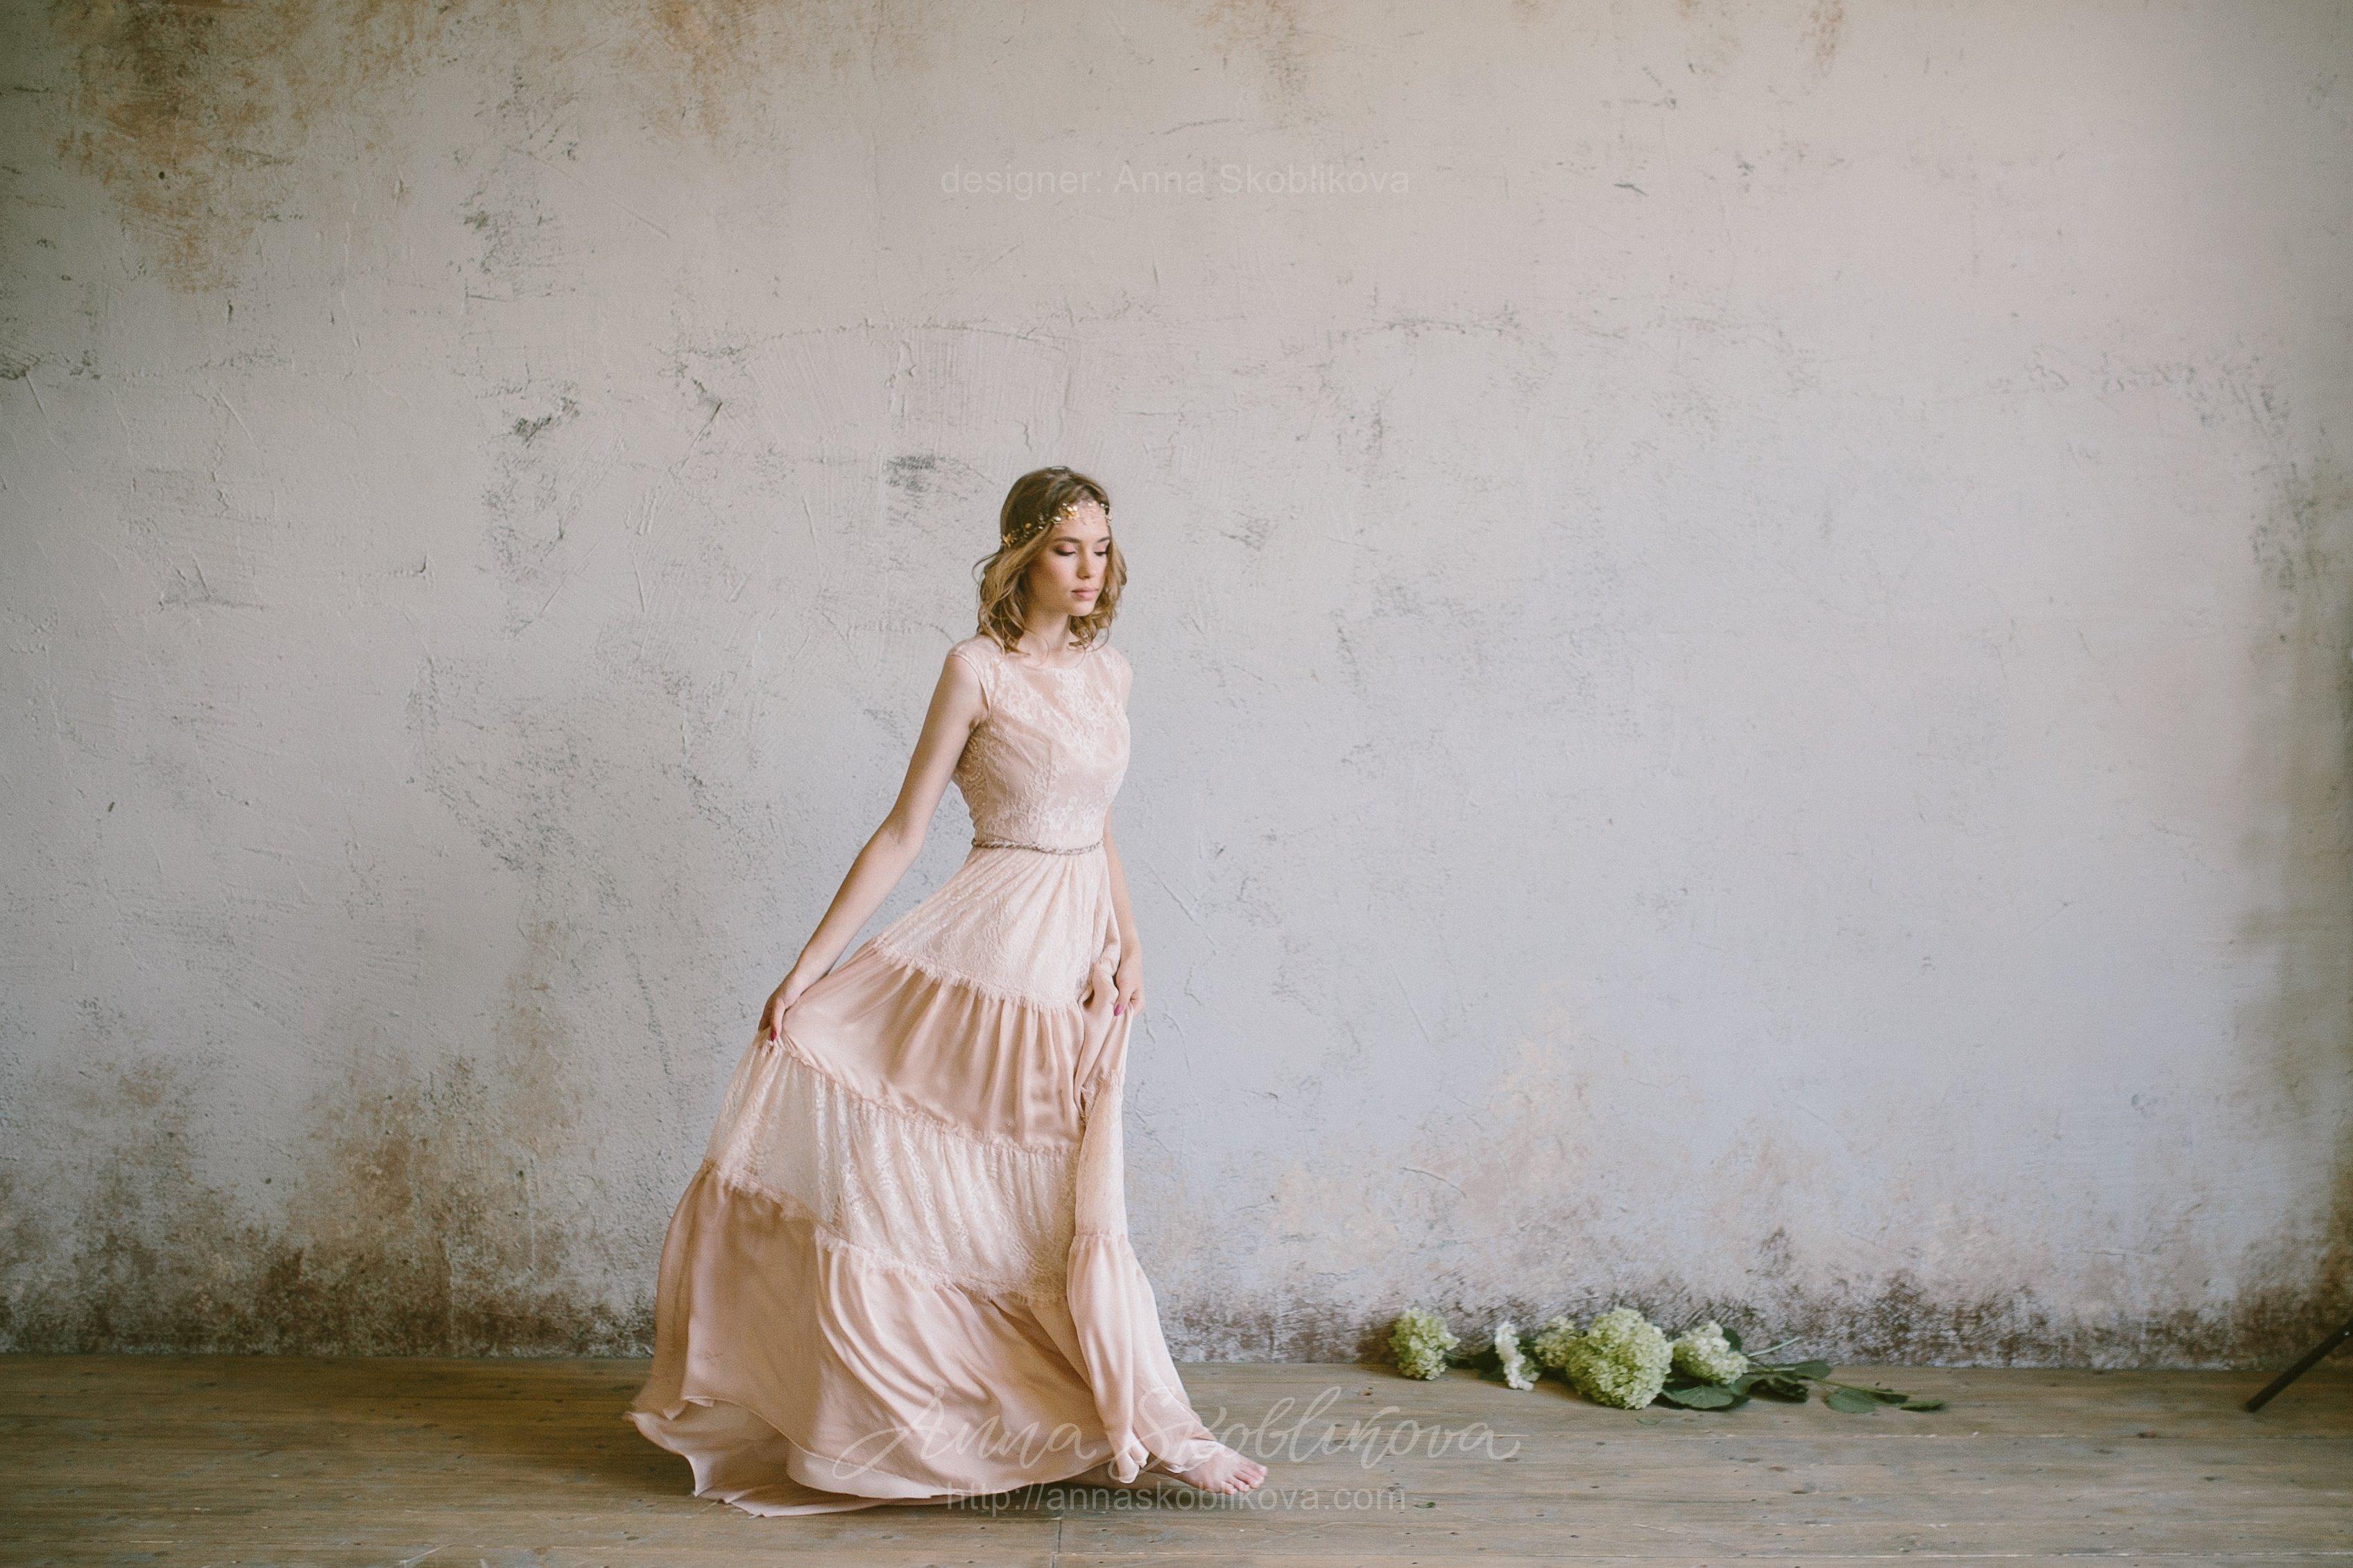 Boho beige wedding dress | Anna Skoblikova - Wedding Dresses ...